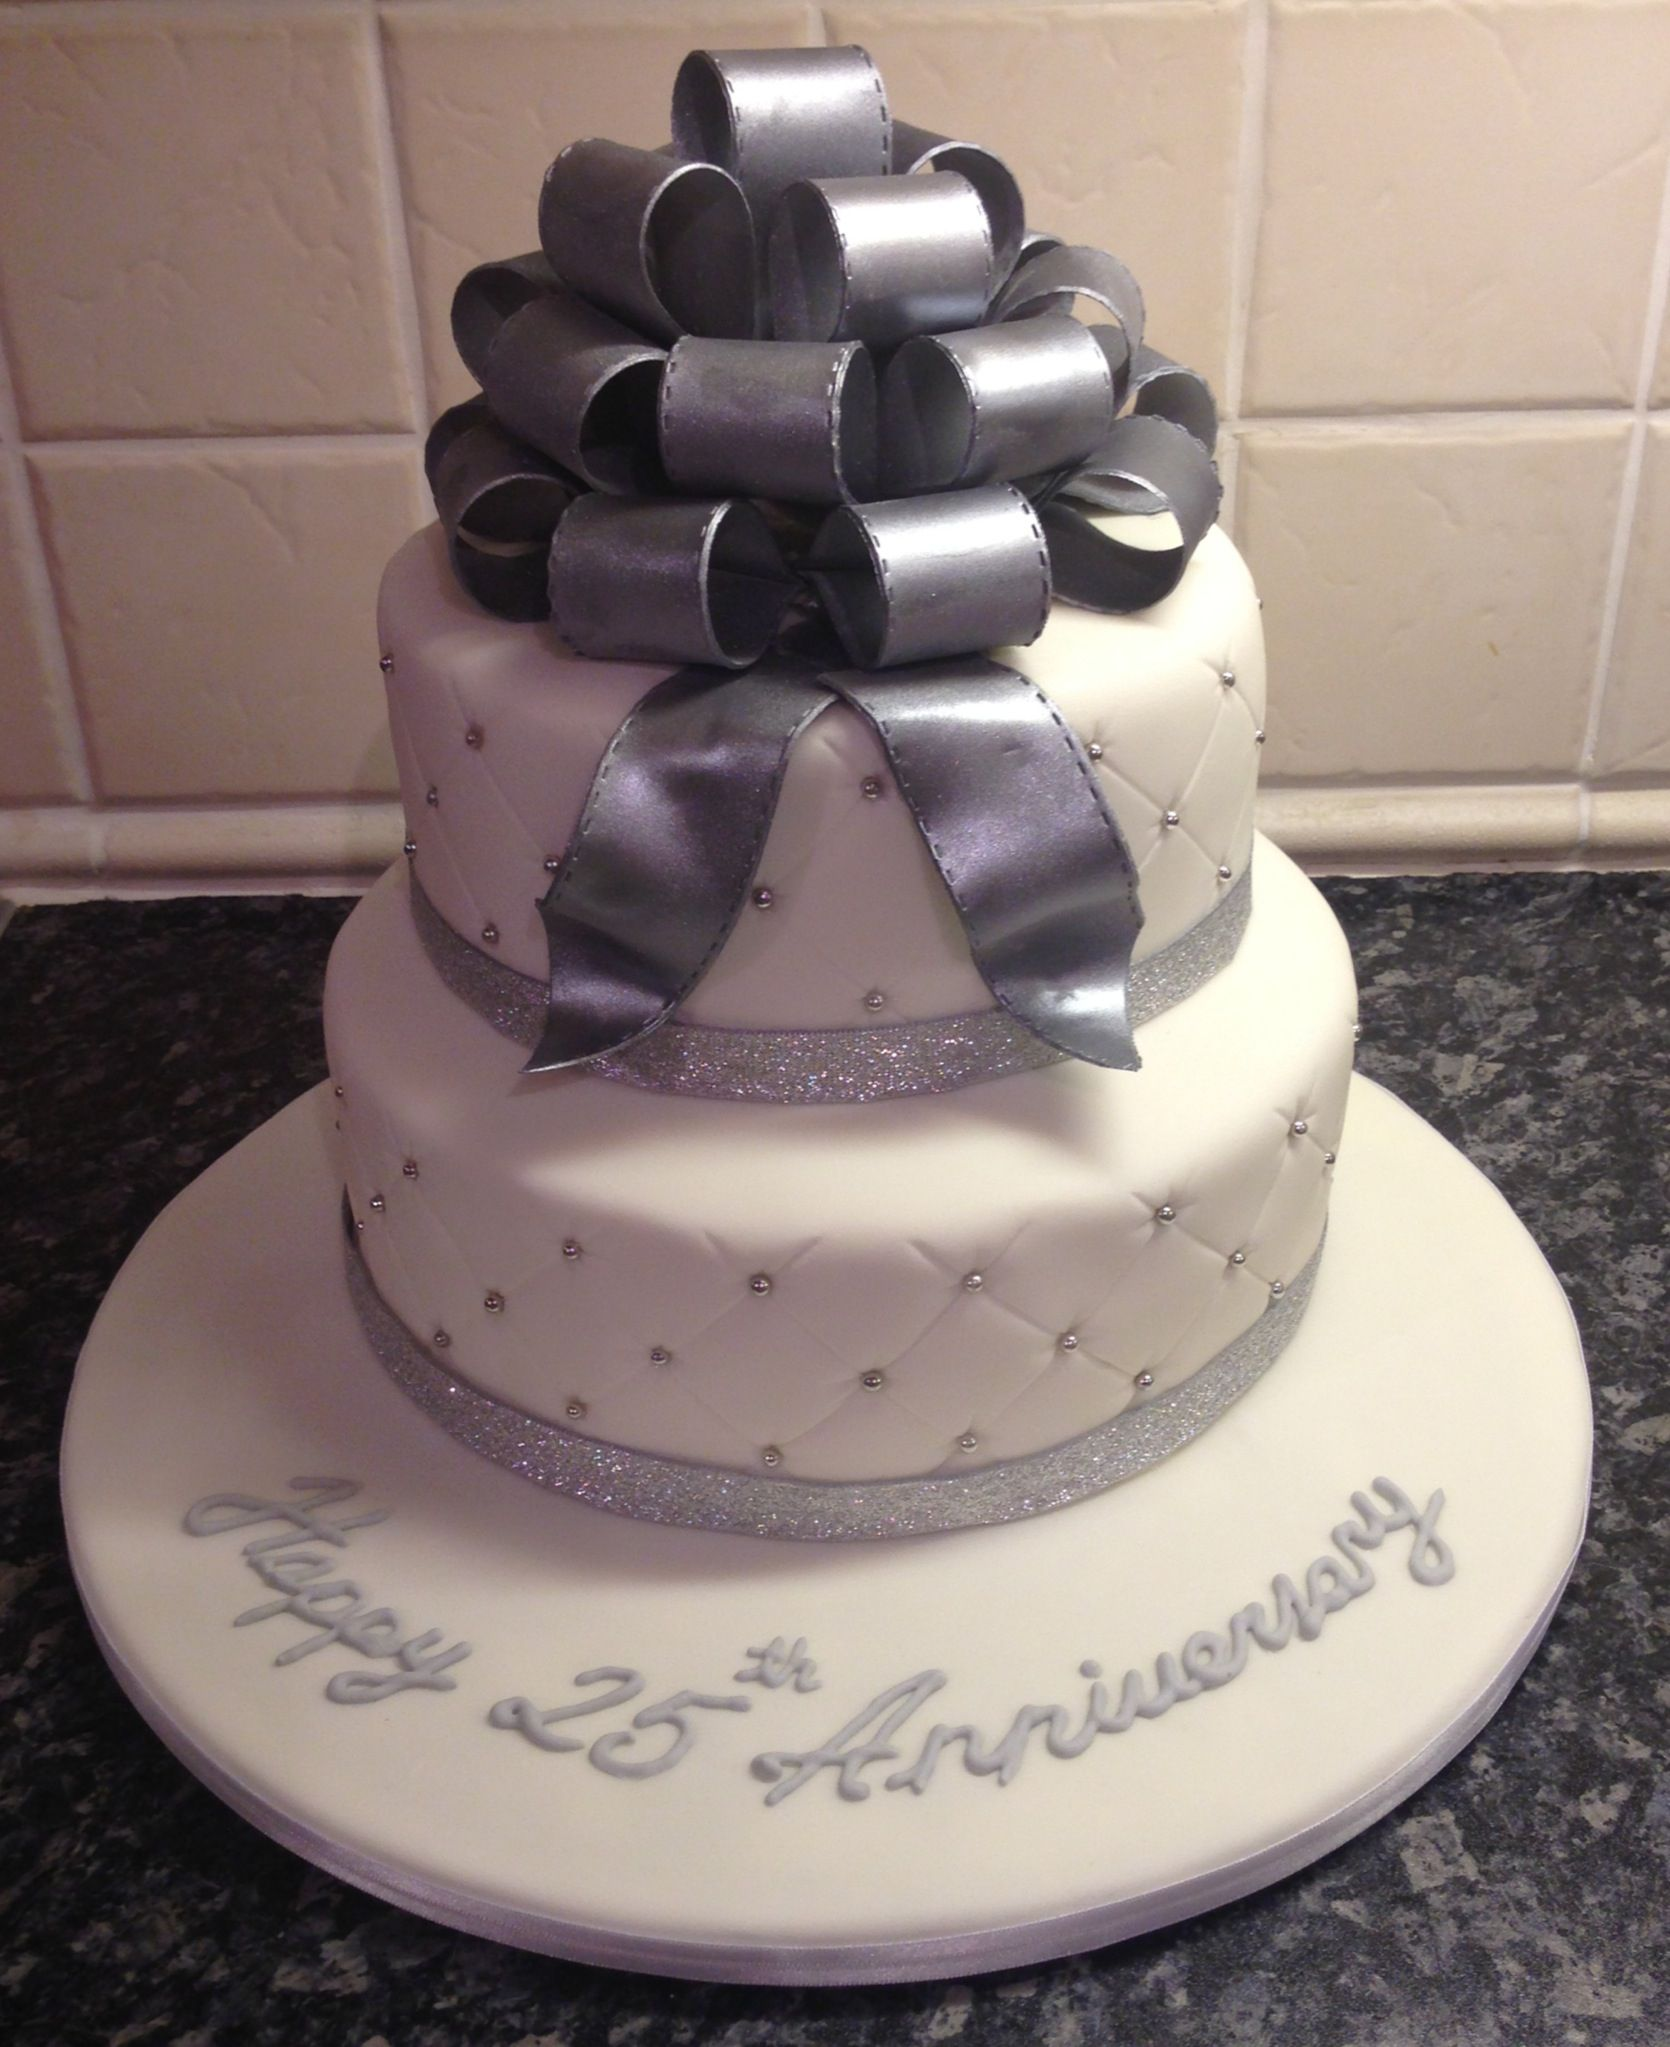 The 25 Best Wedding Cakes: Silver Wedding Anniversary Cake